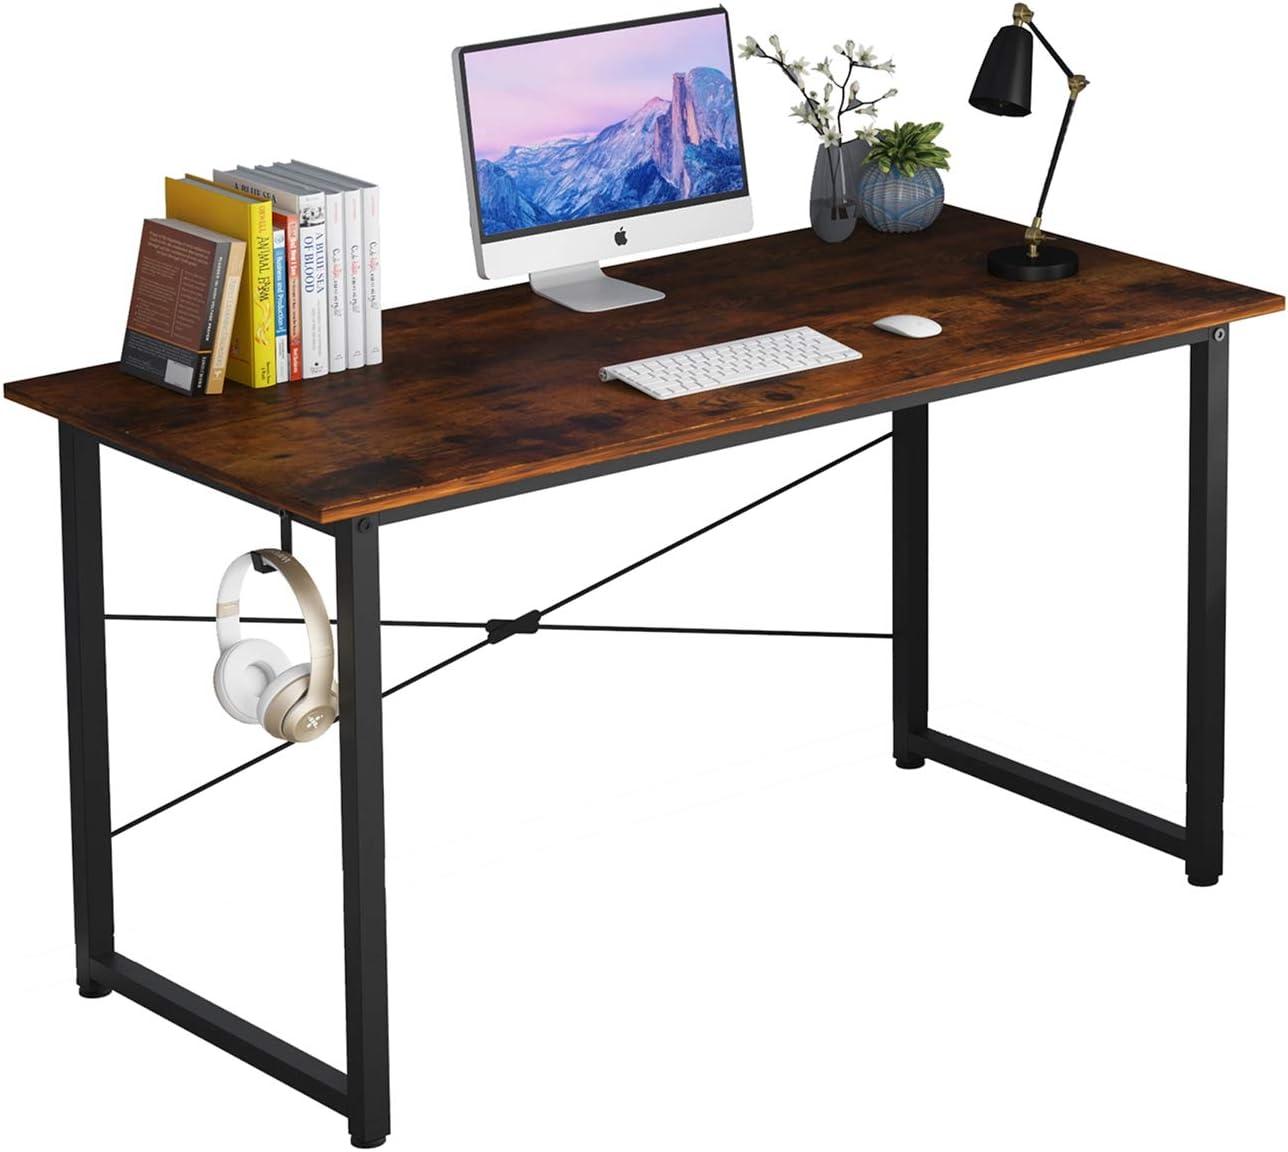 Home Office Computer Desk, SOHO Writing Desk